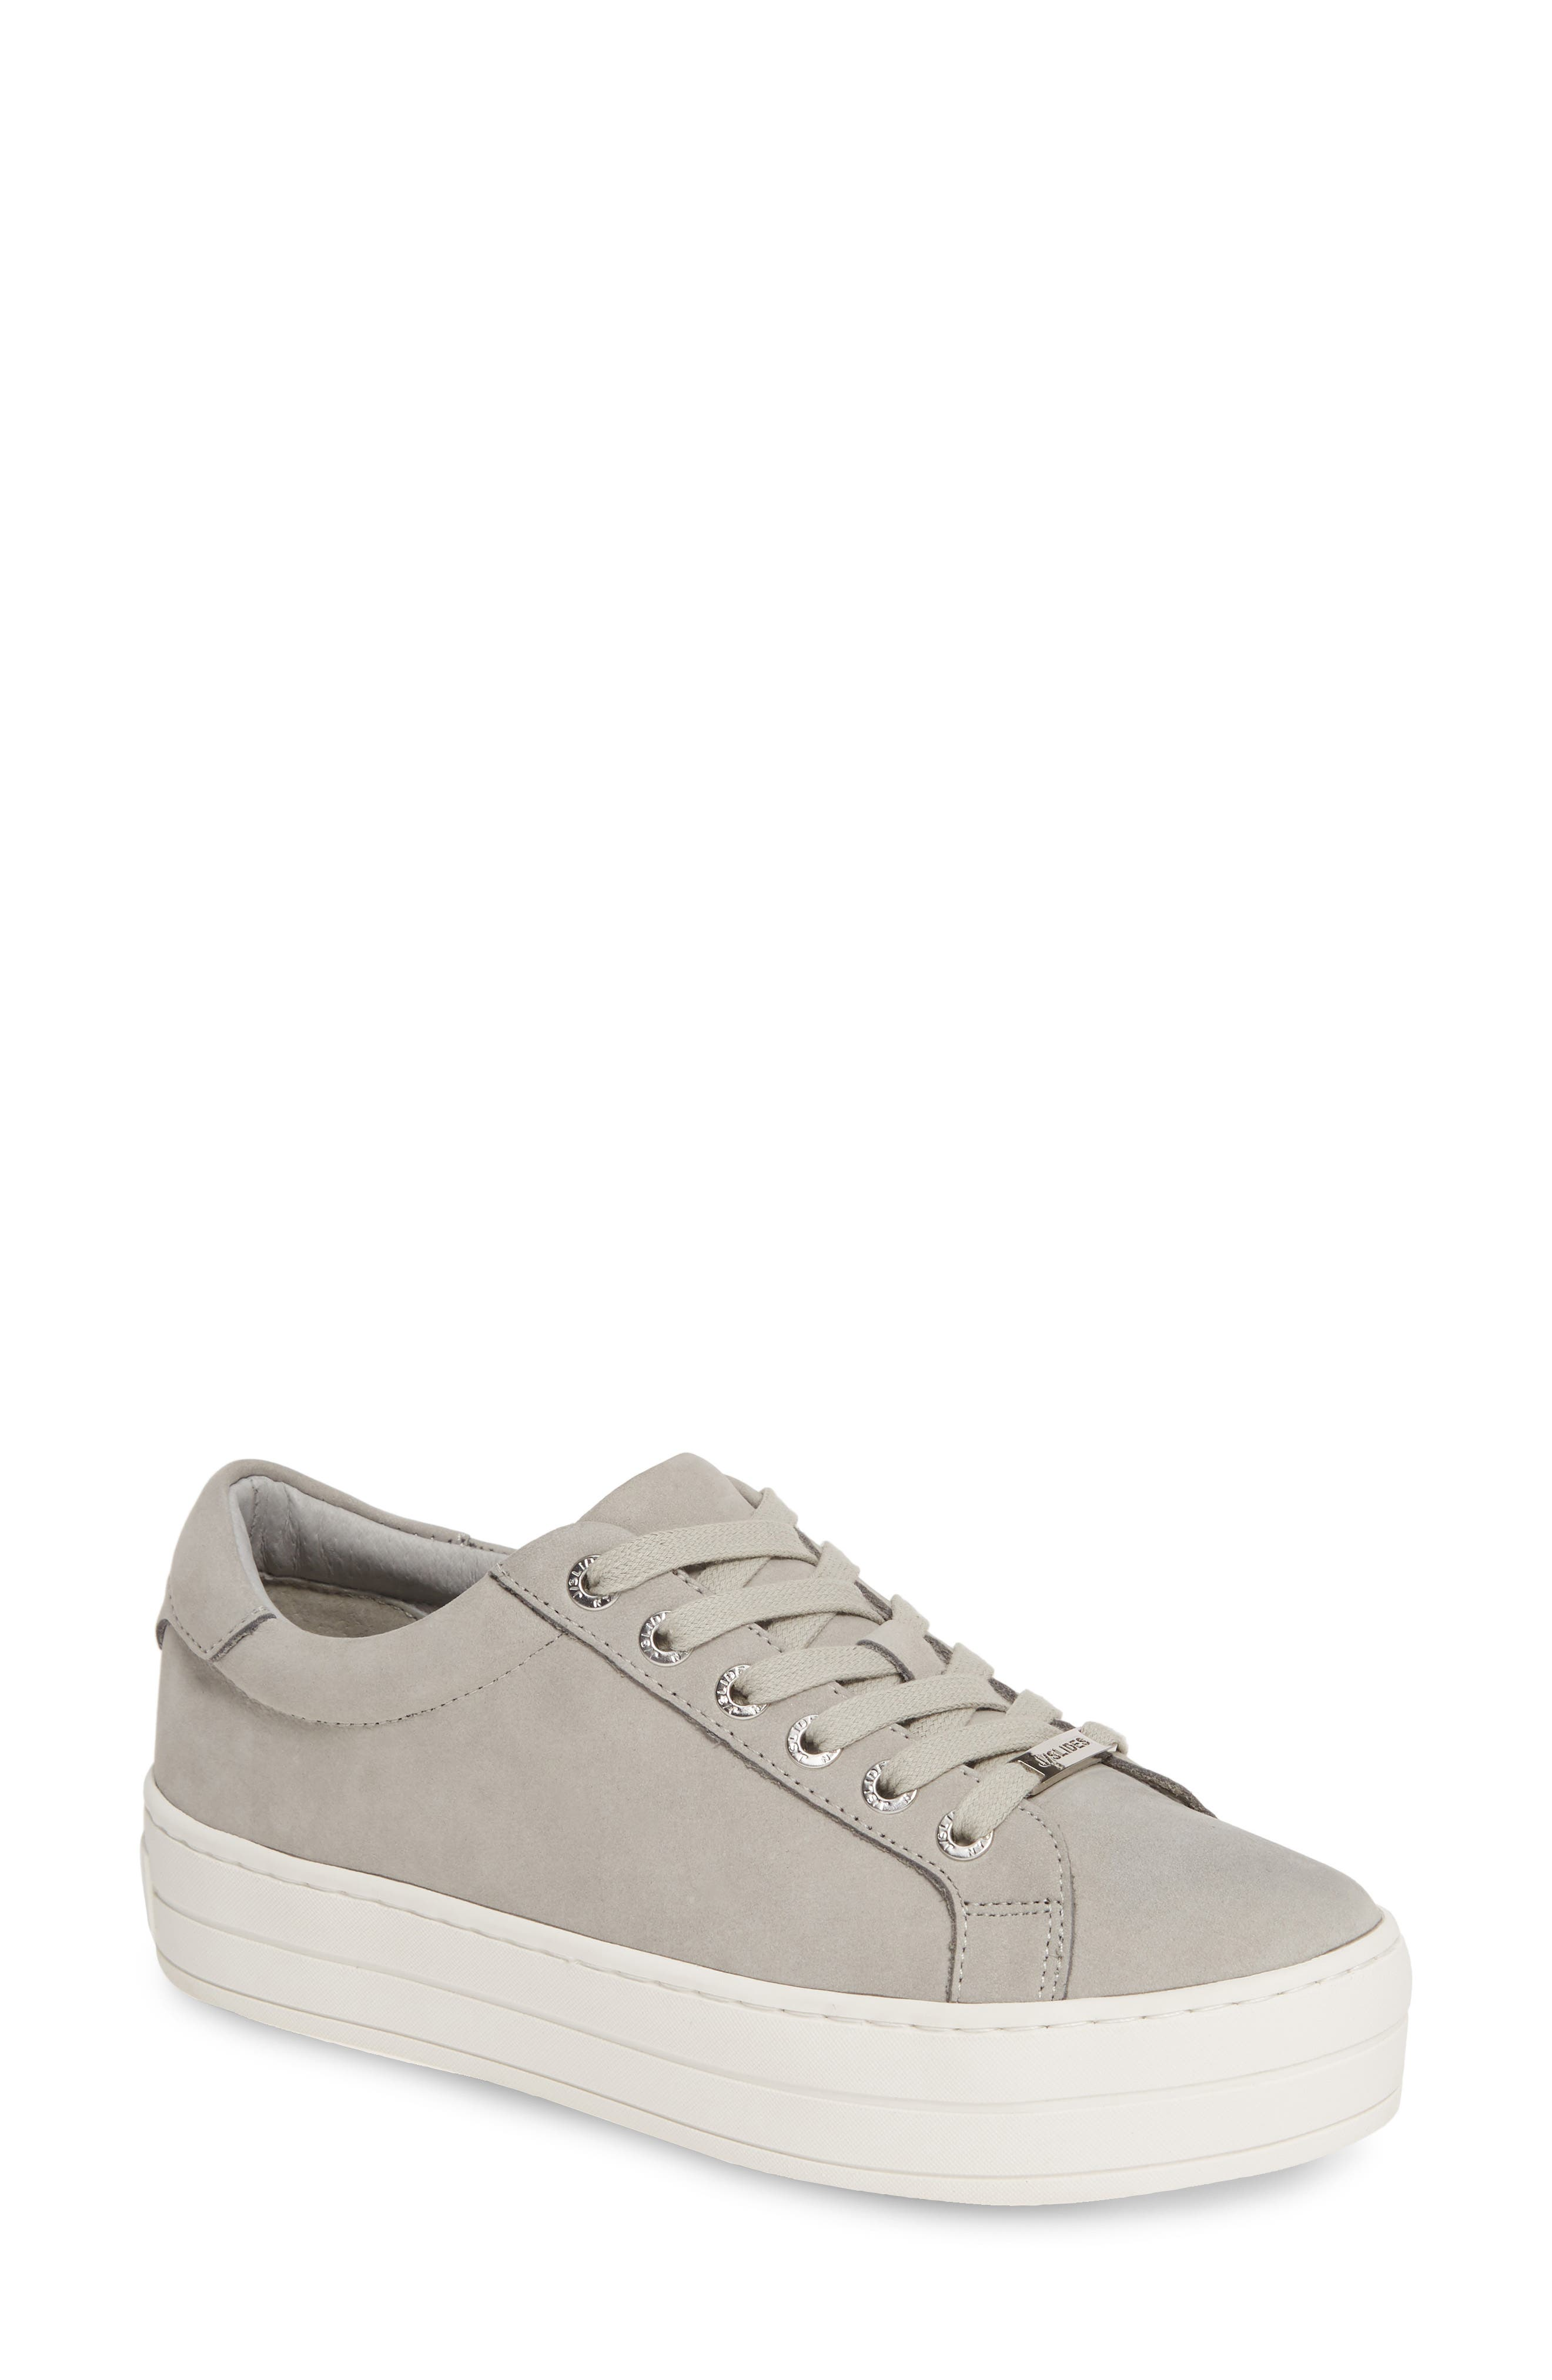 Jslides Hippie Platform Sneaker, Grey